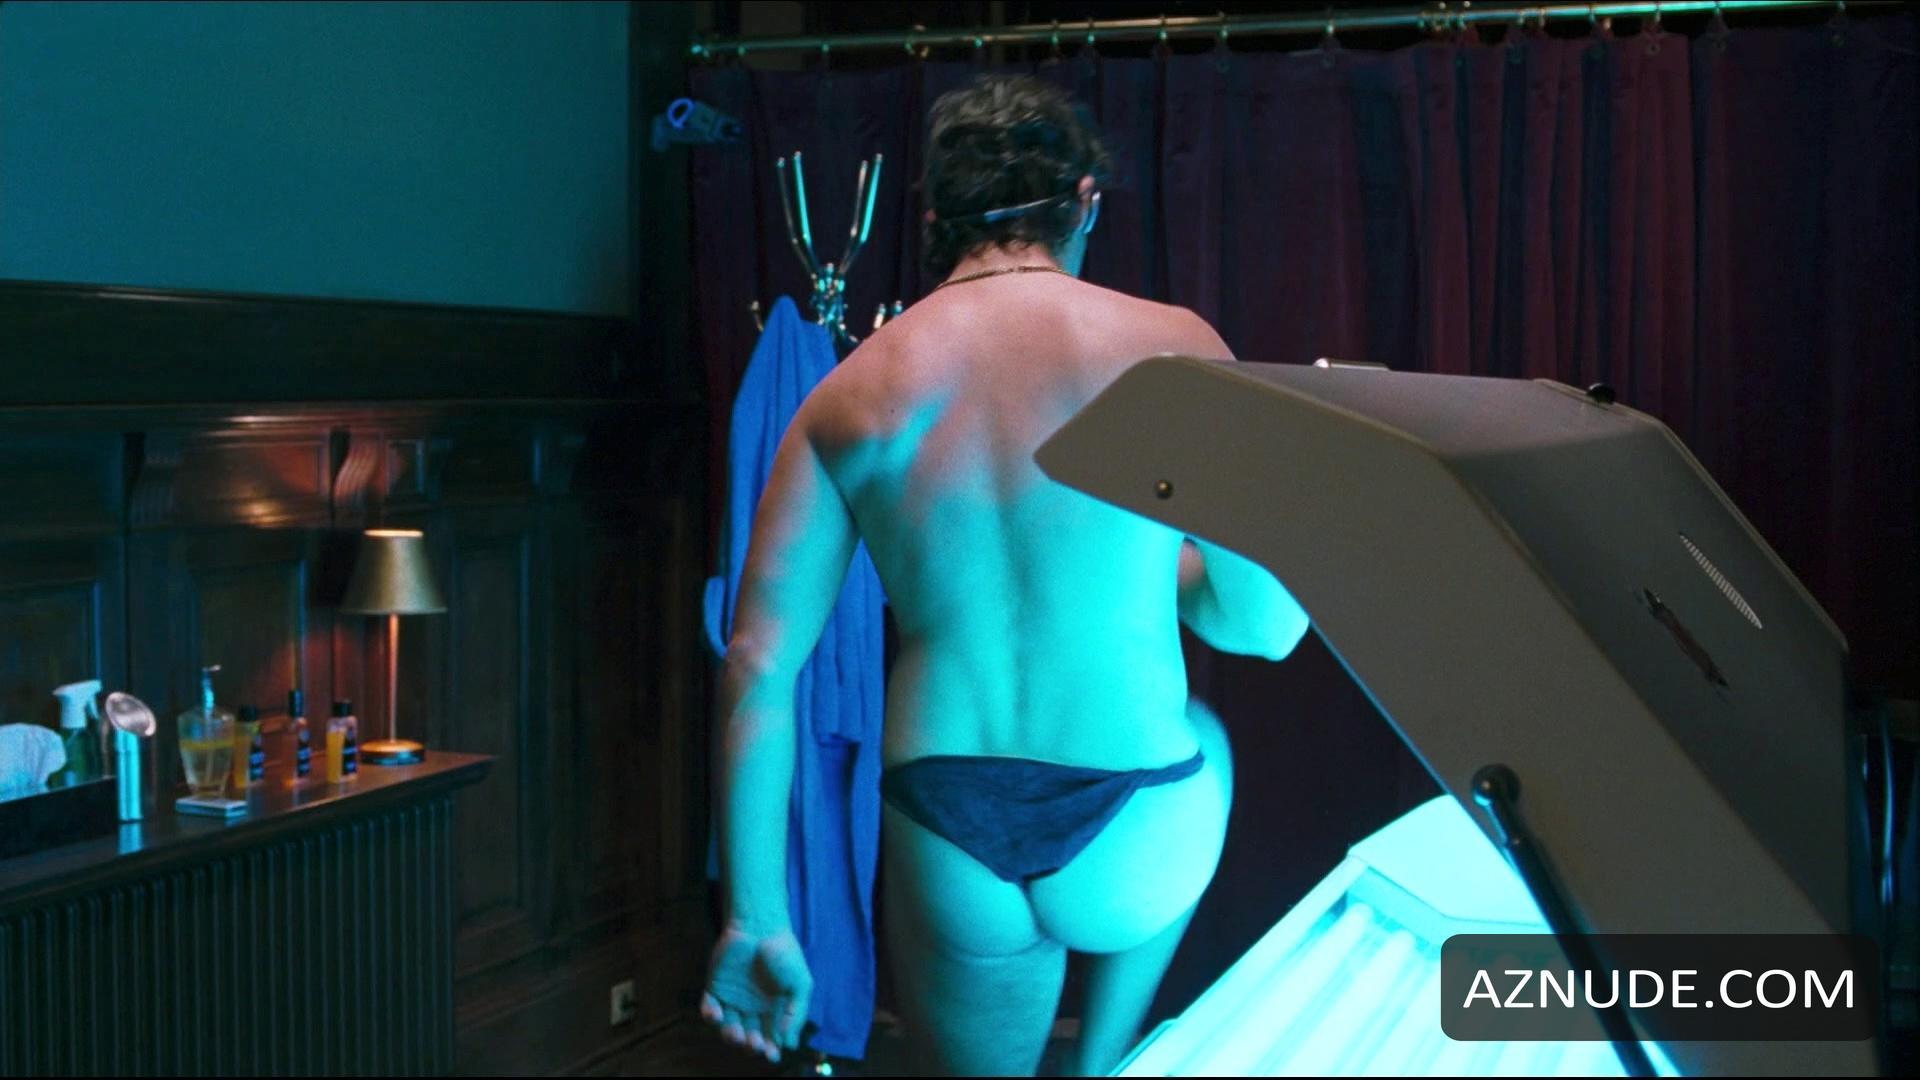 Gay Gigolo Nude Man Pics 59